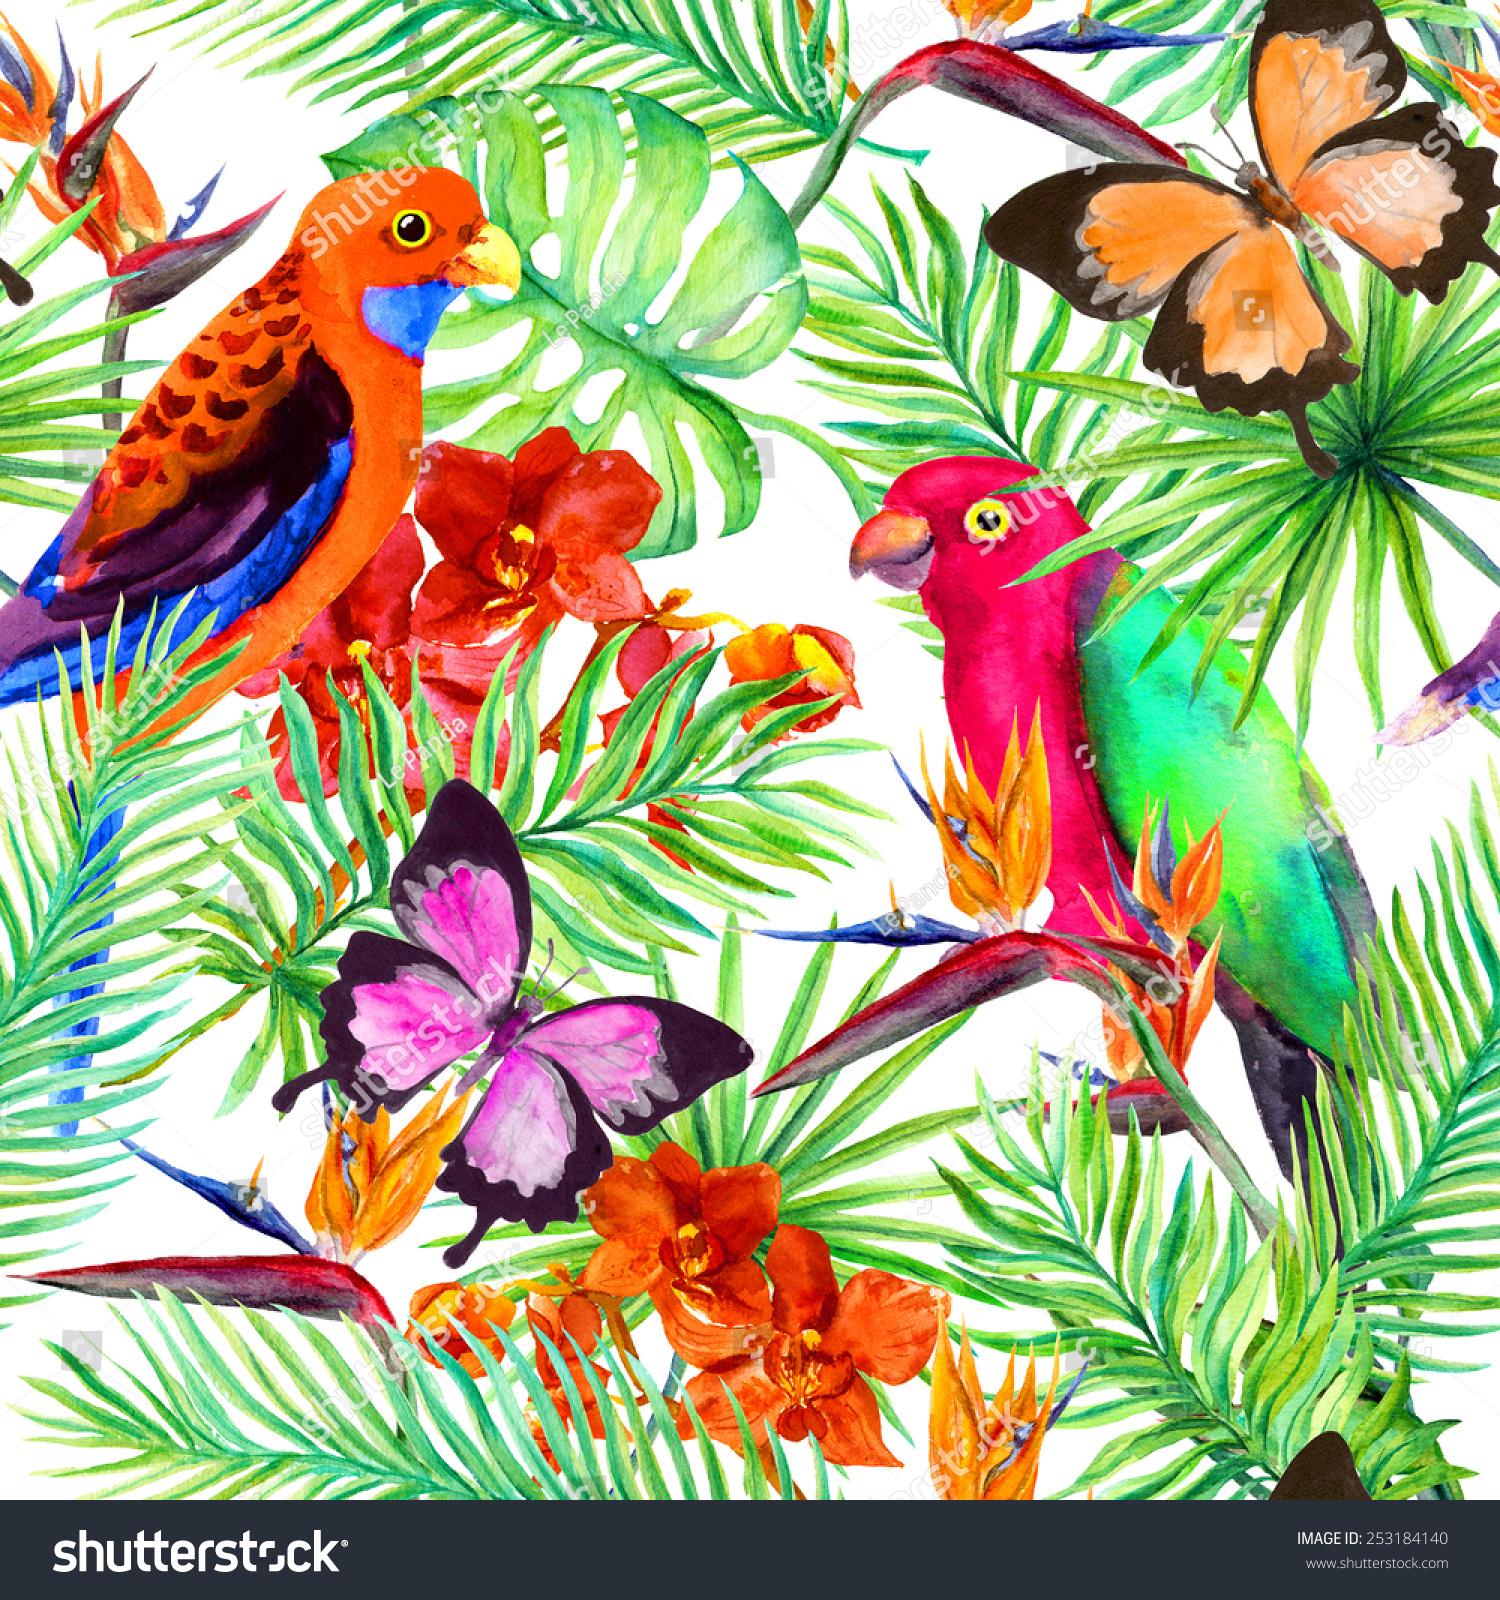 exotic colors. pintando o cabelo com tinta exotic. beautiful